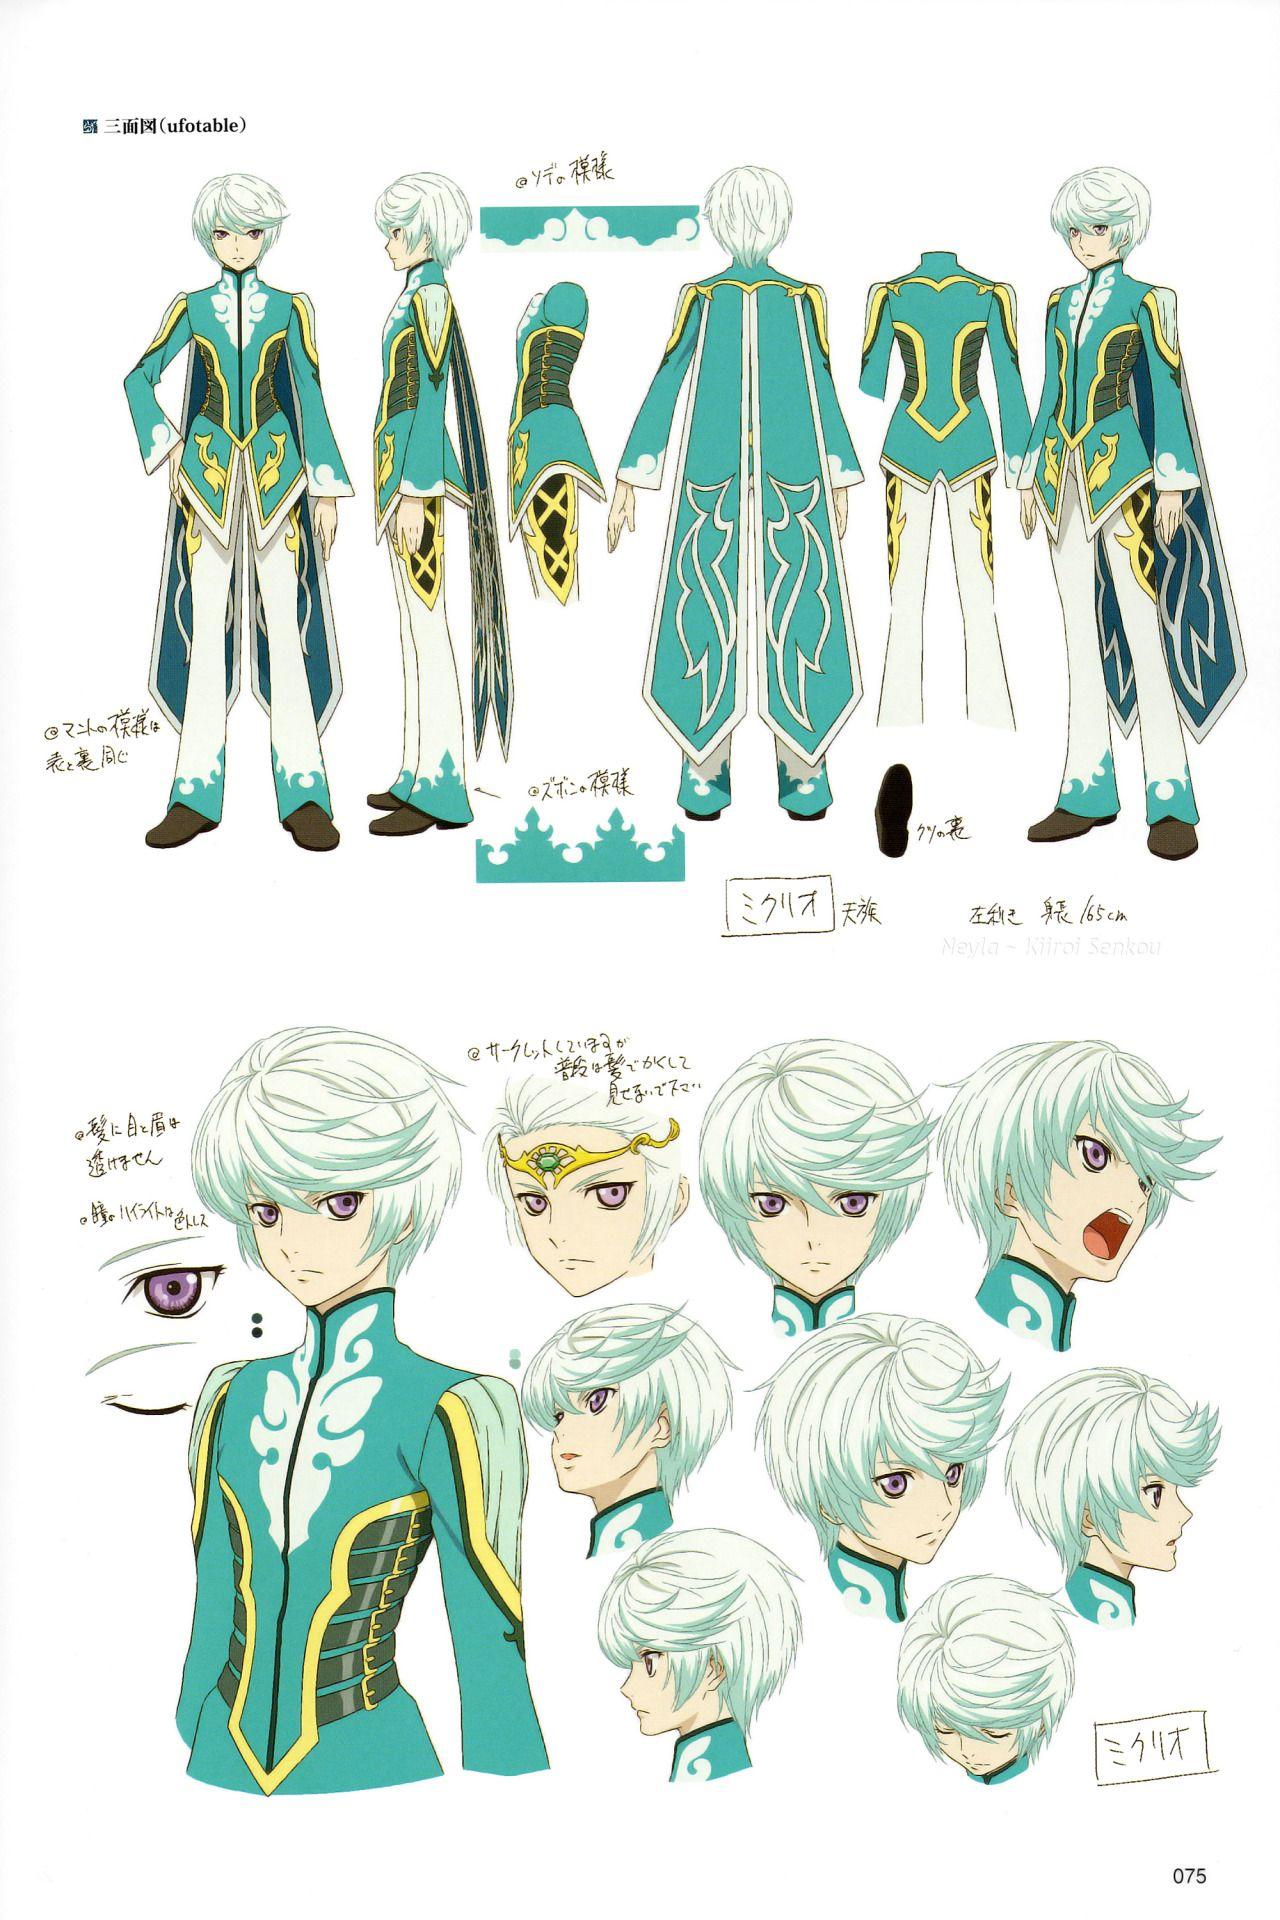 neylakiiroisenkou Anime character design, Tales of